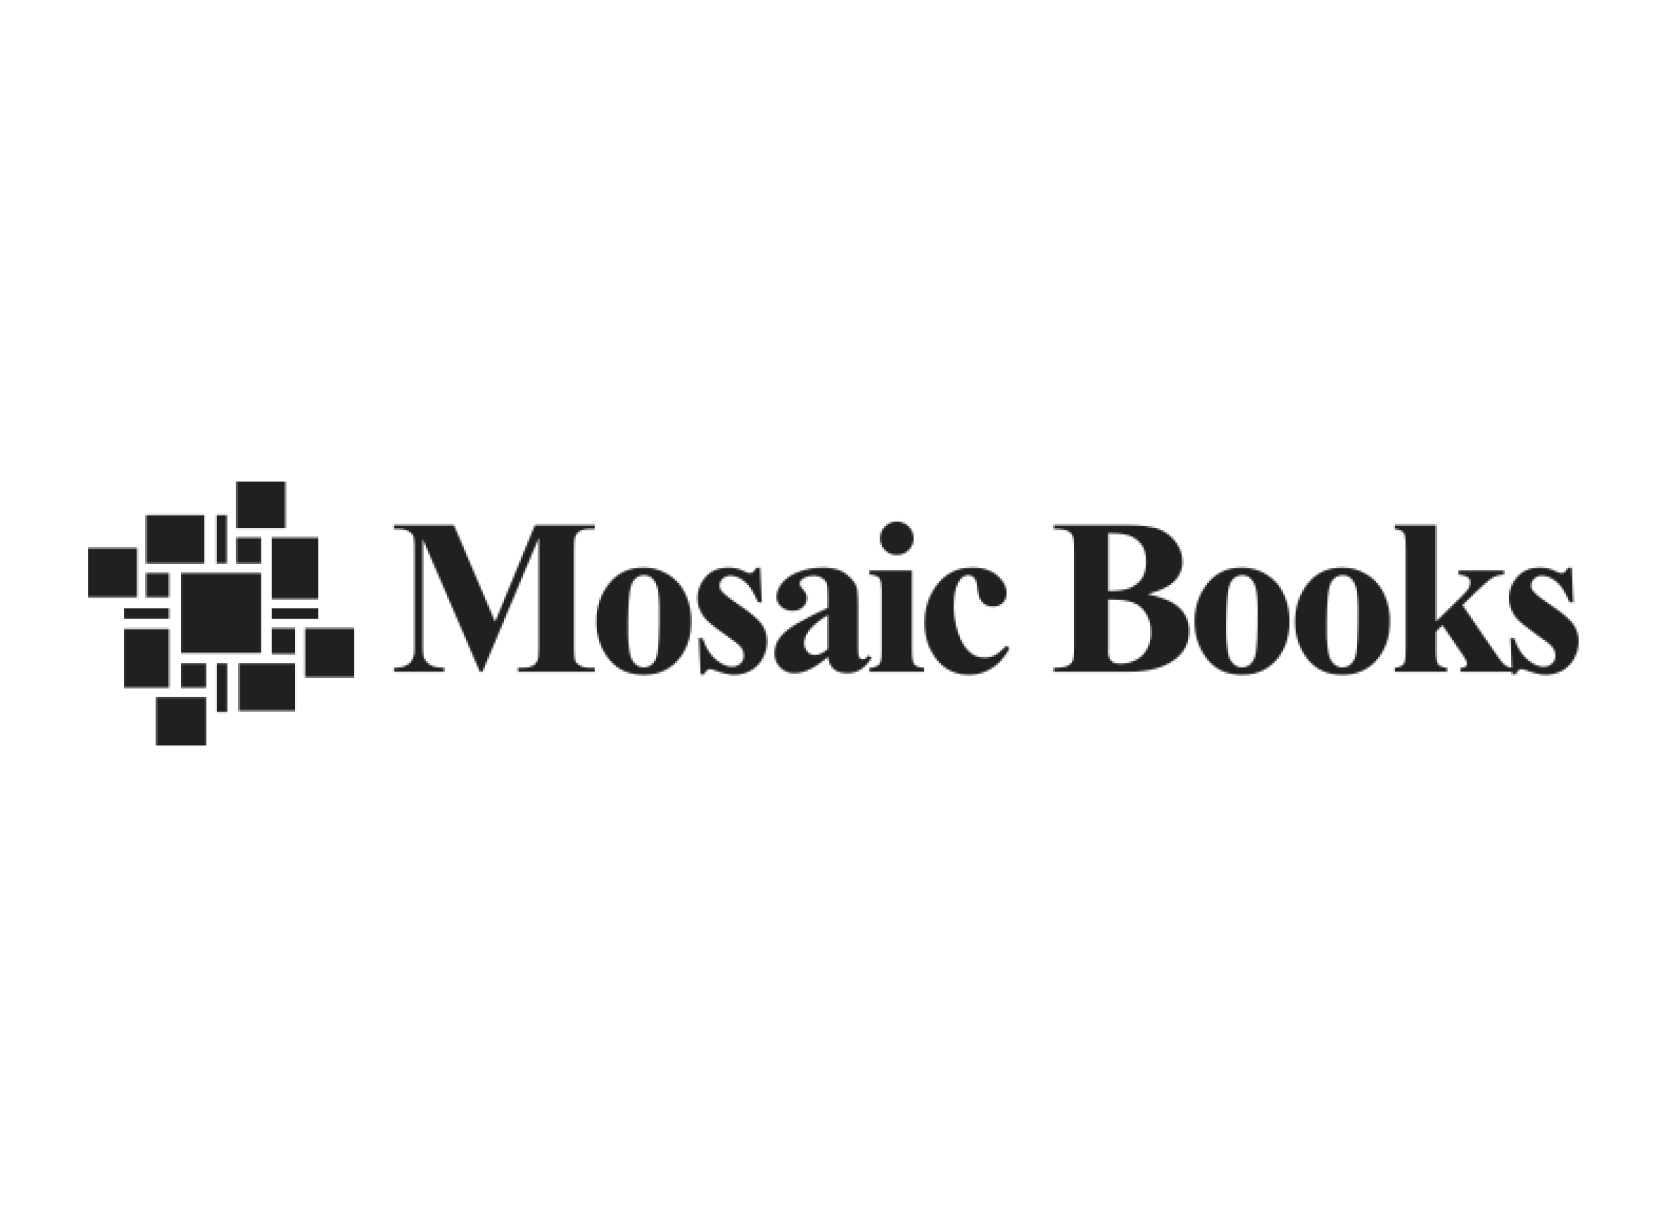 Mosiac Books logo